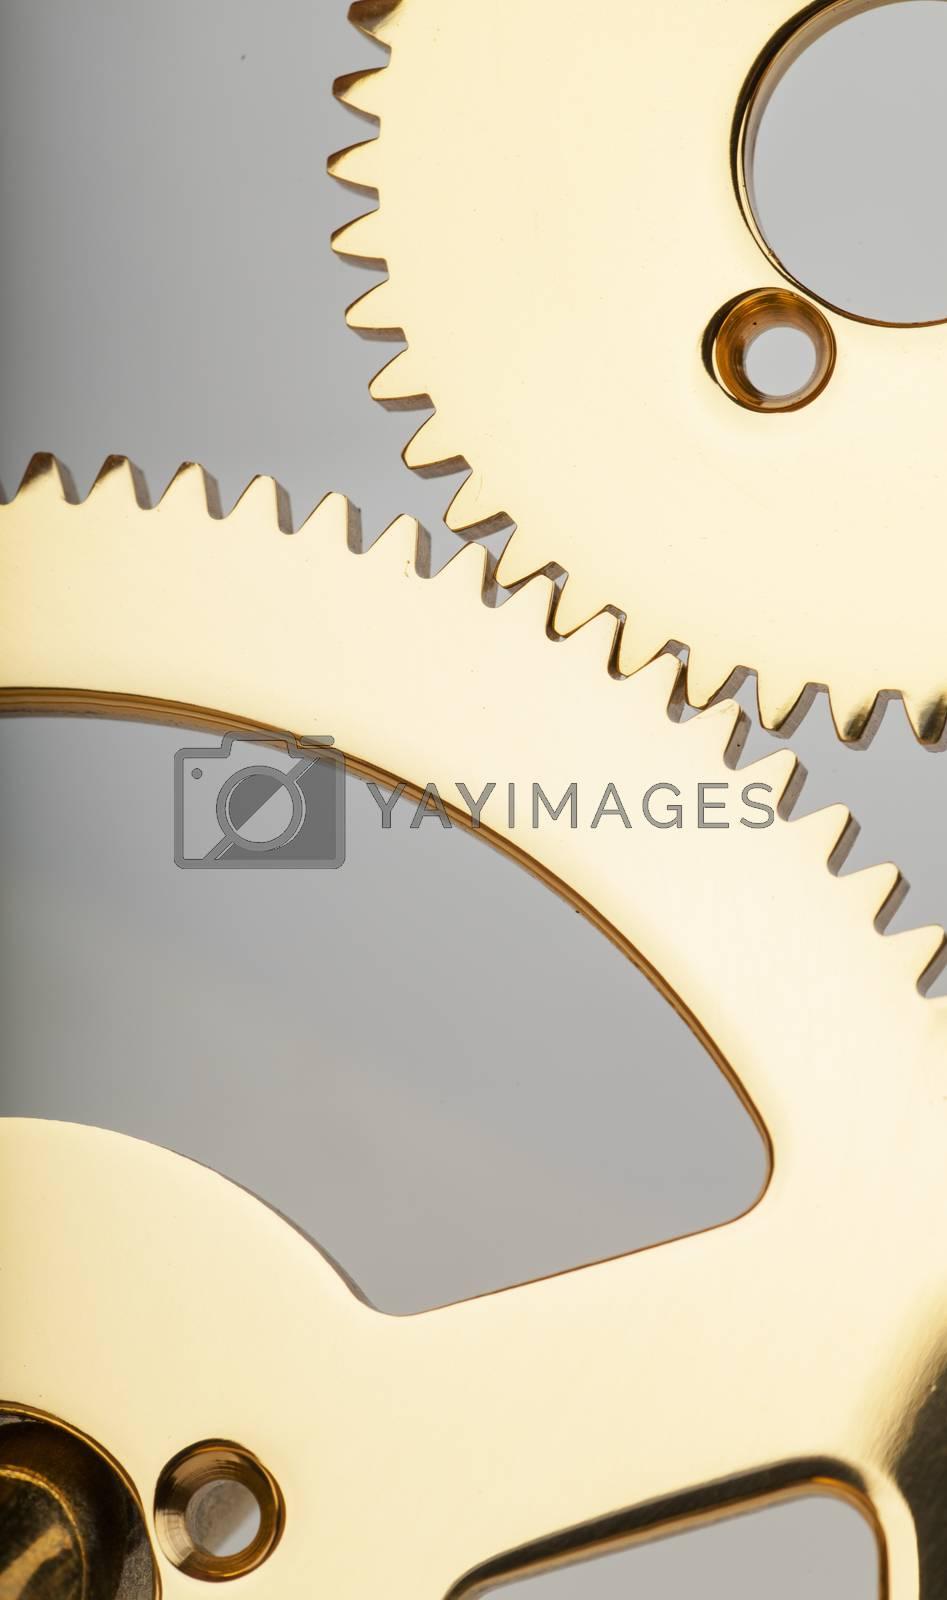 Macro view of two golden gears